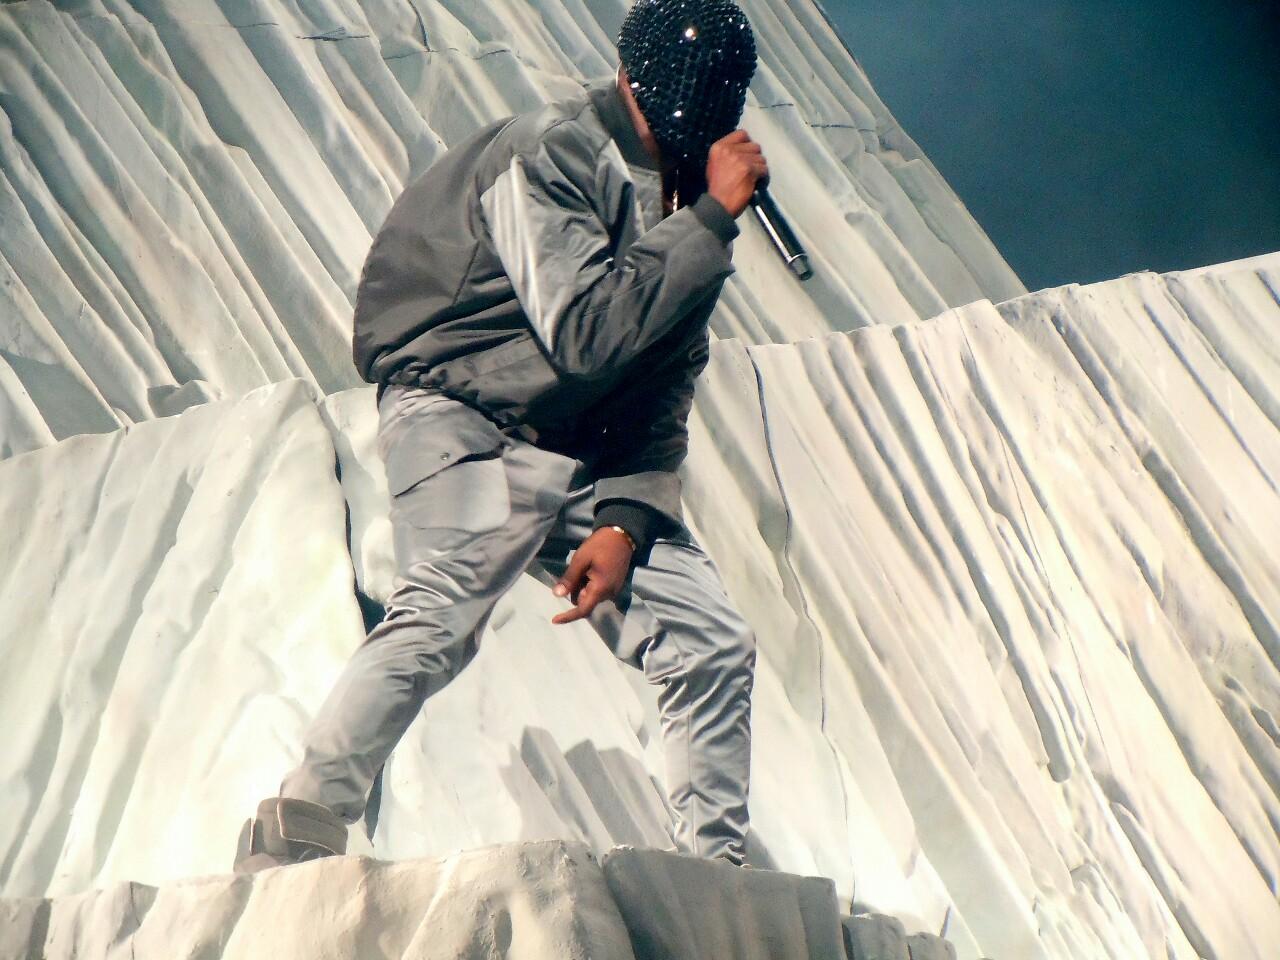 Kanye Finds Jesus At Yeezus Tour Opener In Seattle - Stereogum Kanye West Yeezus Concert